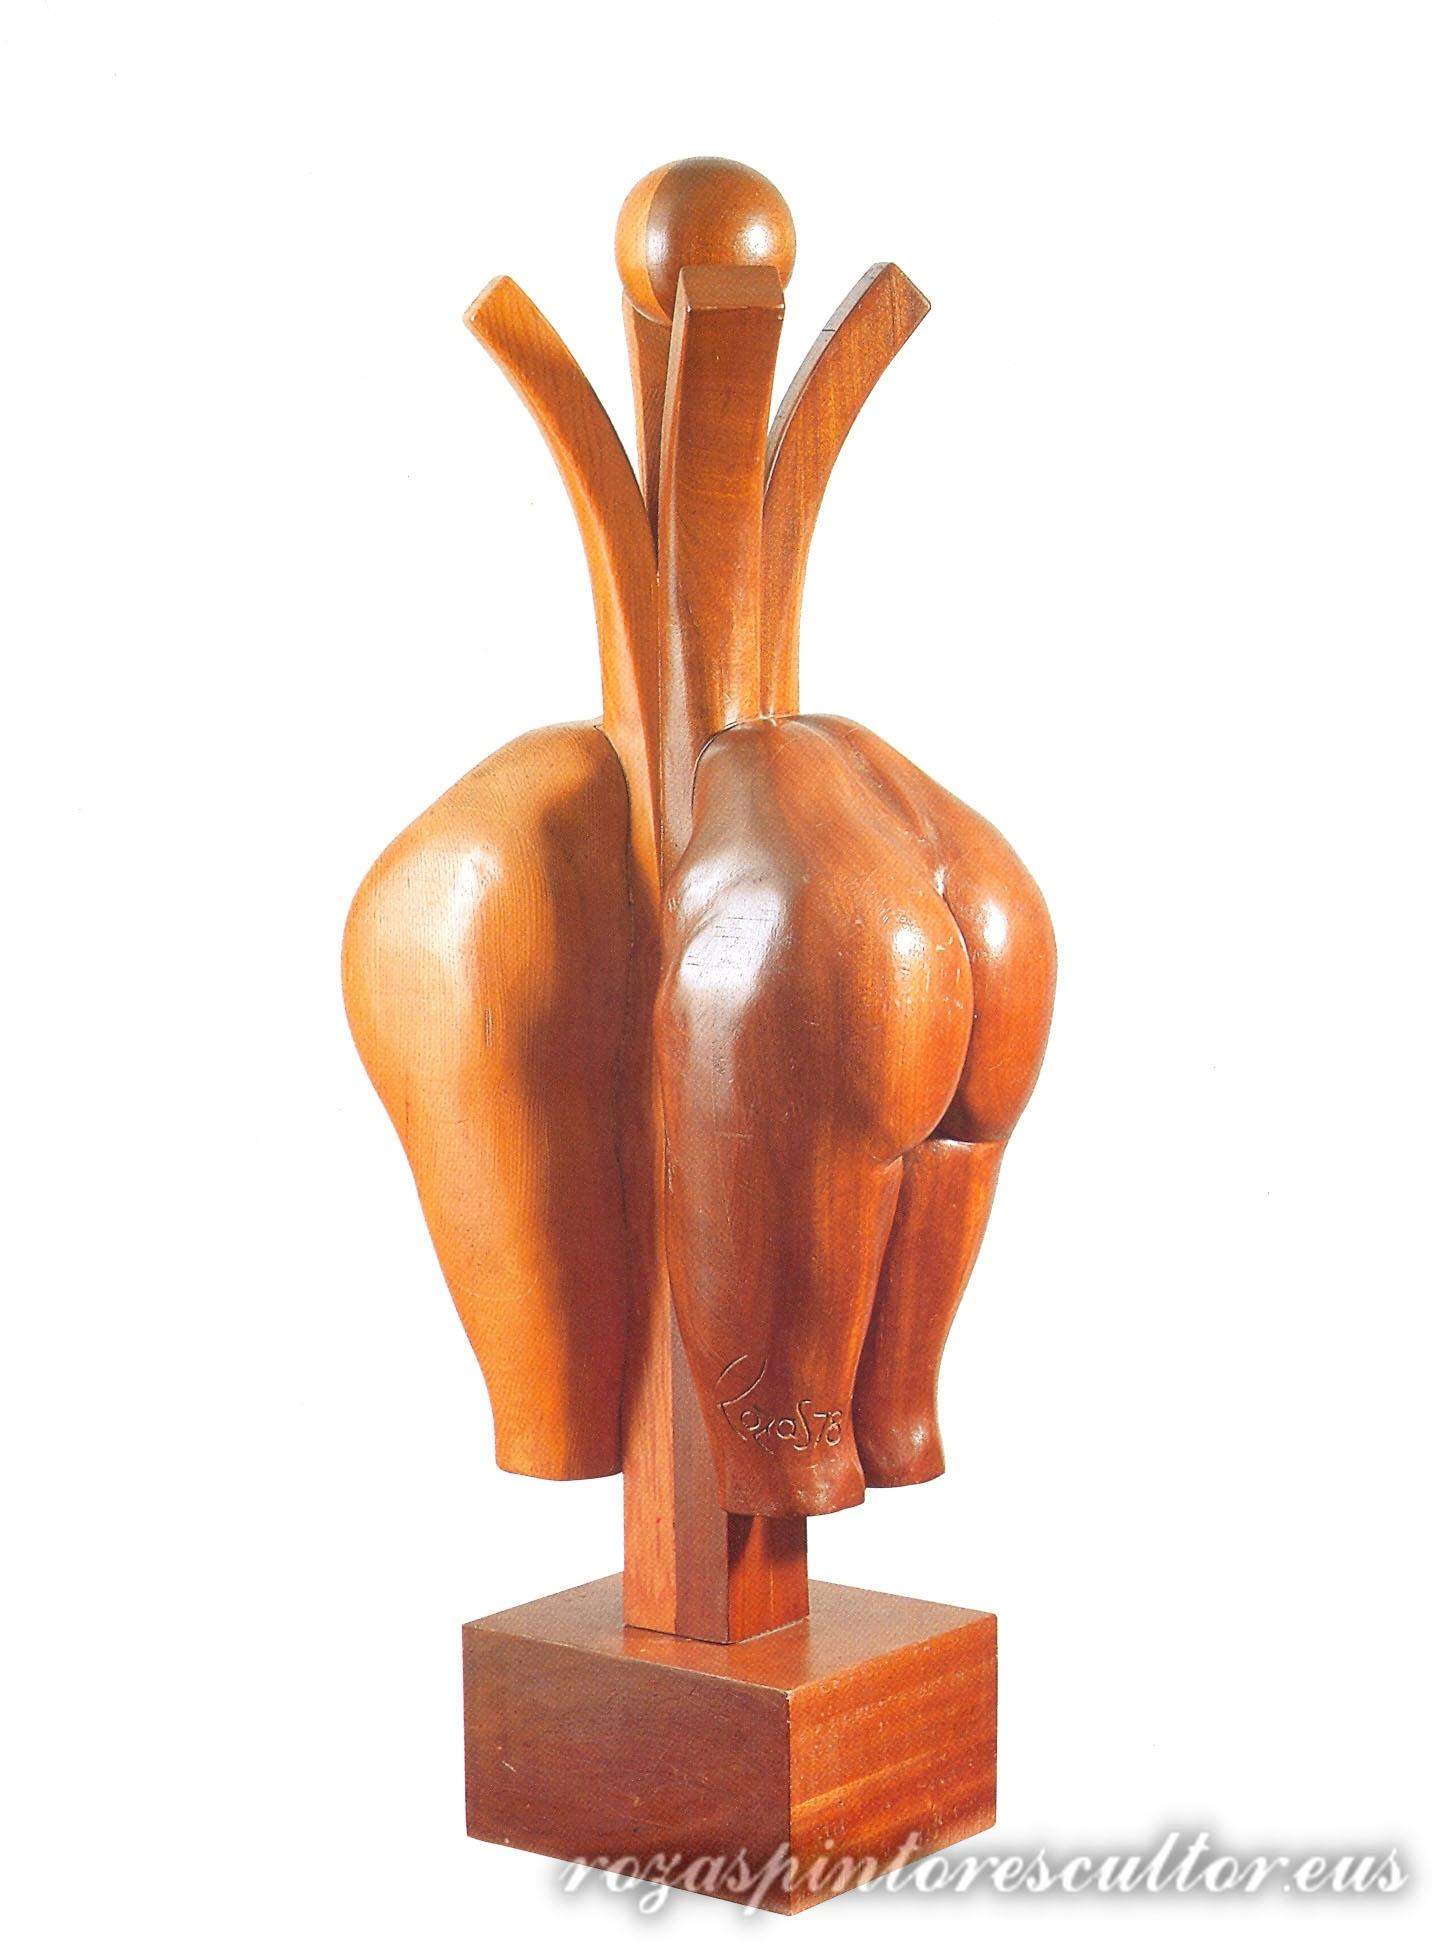 1978 Txalaparta 87x42x29 instrumento musical con madera